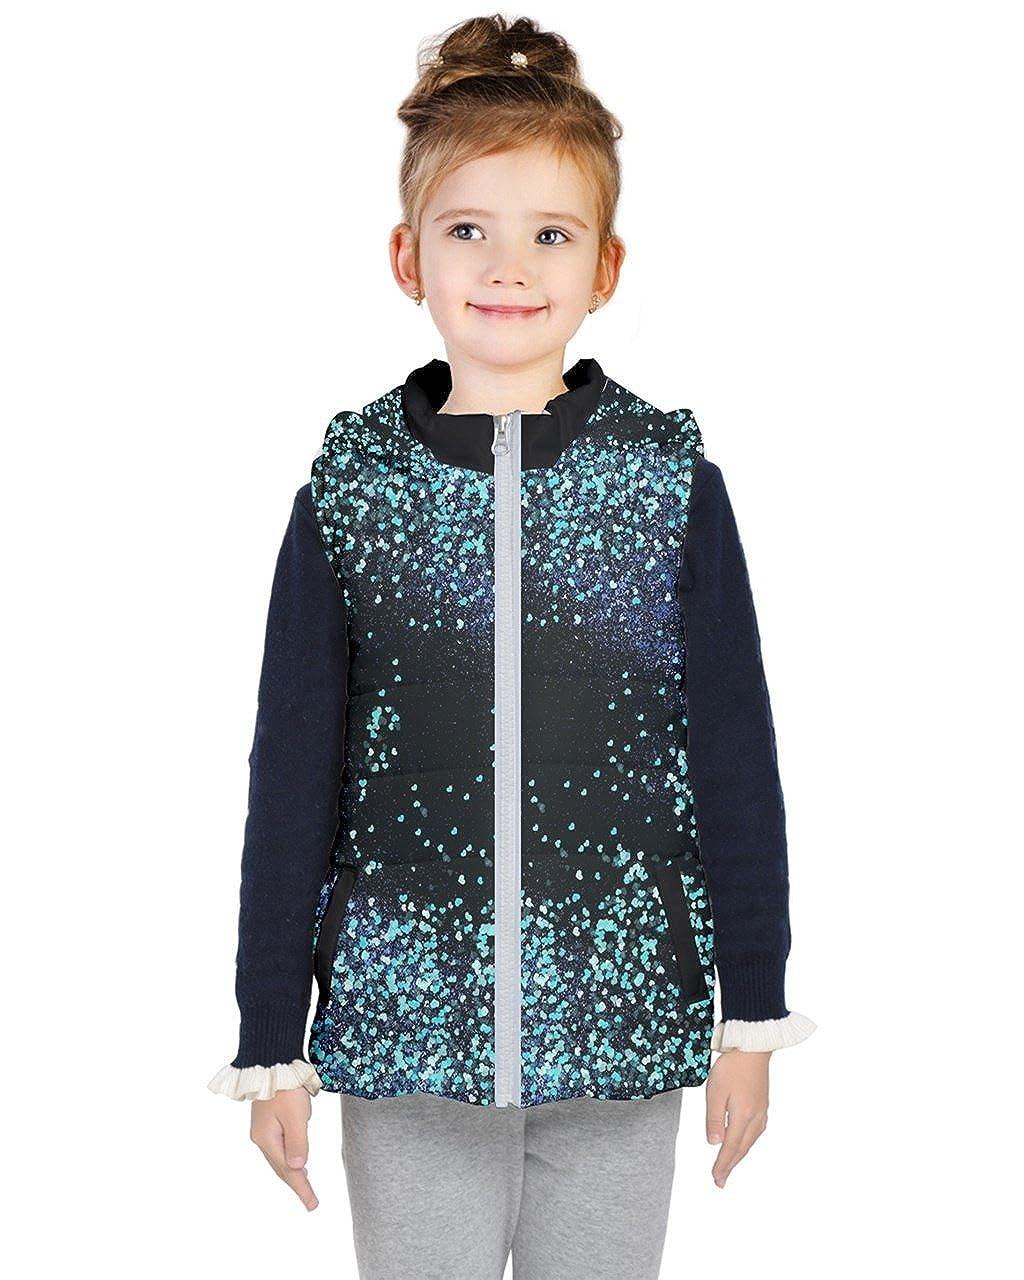 PattyCandy Kids Fashion Style Dinosaur Patterns Girls Lightweight Puffer Vest PattyCandy-135823947